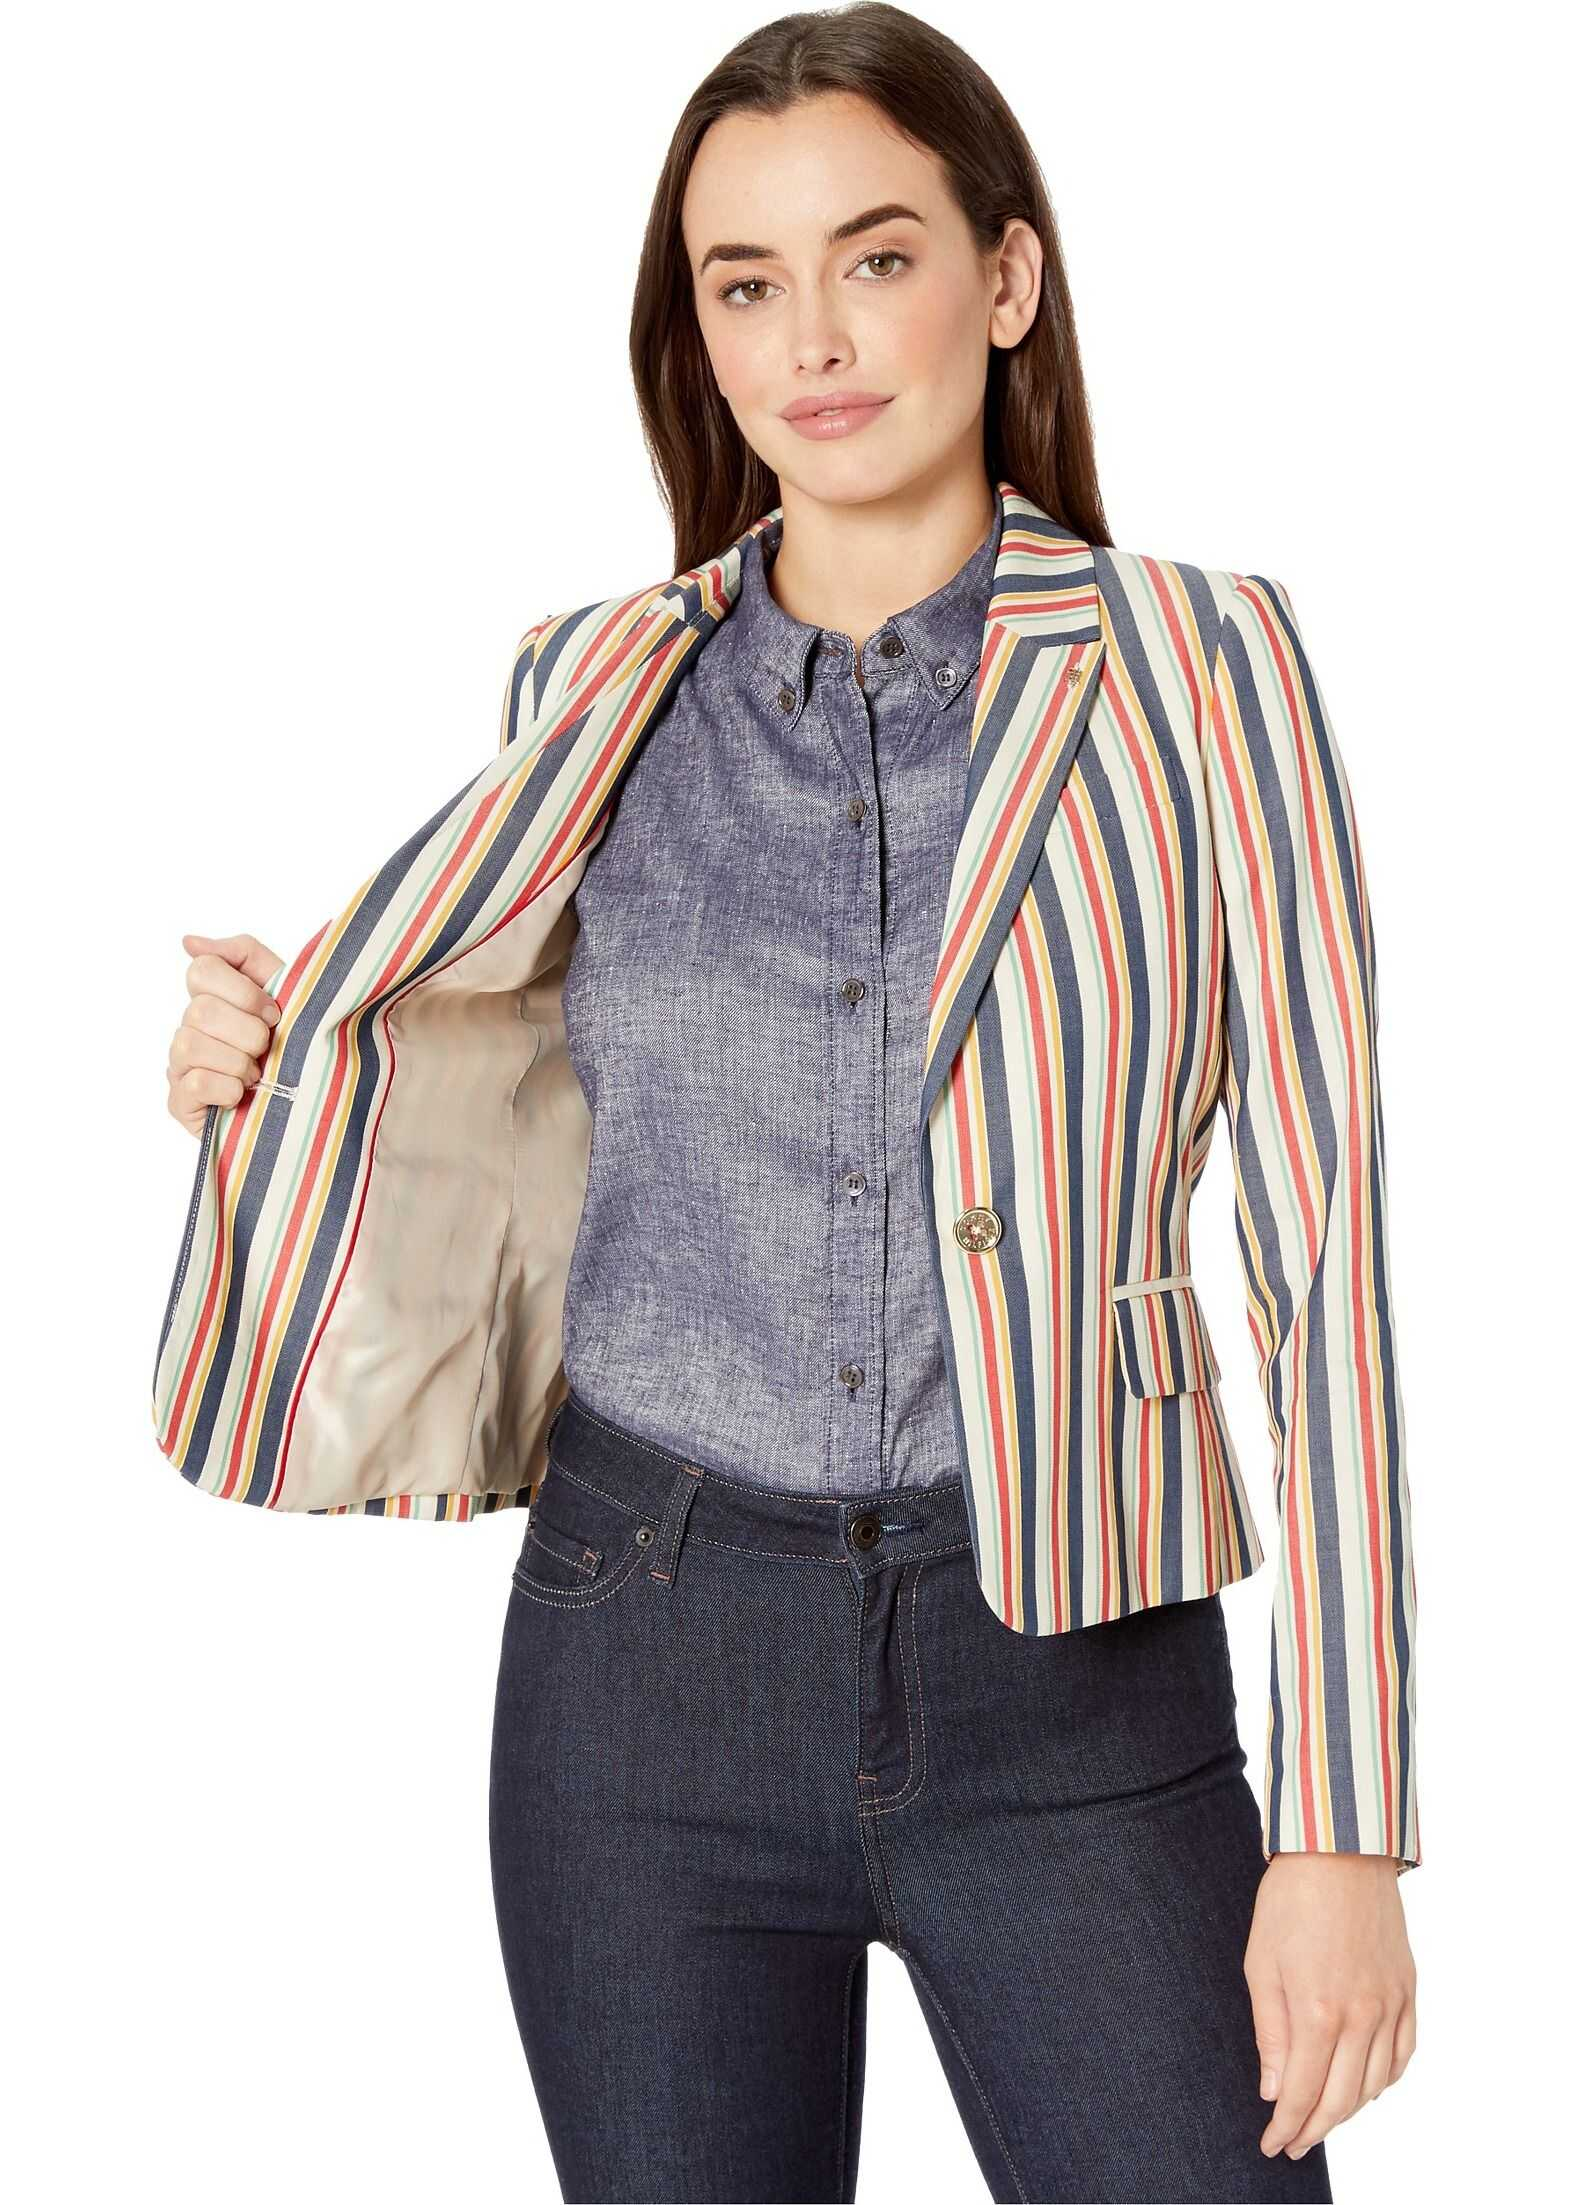 Tommy Hilfiger Multi Stripe One-Button Jacket Khaki Multi